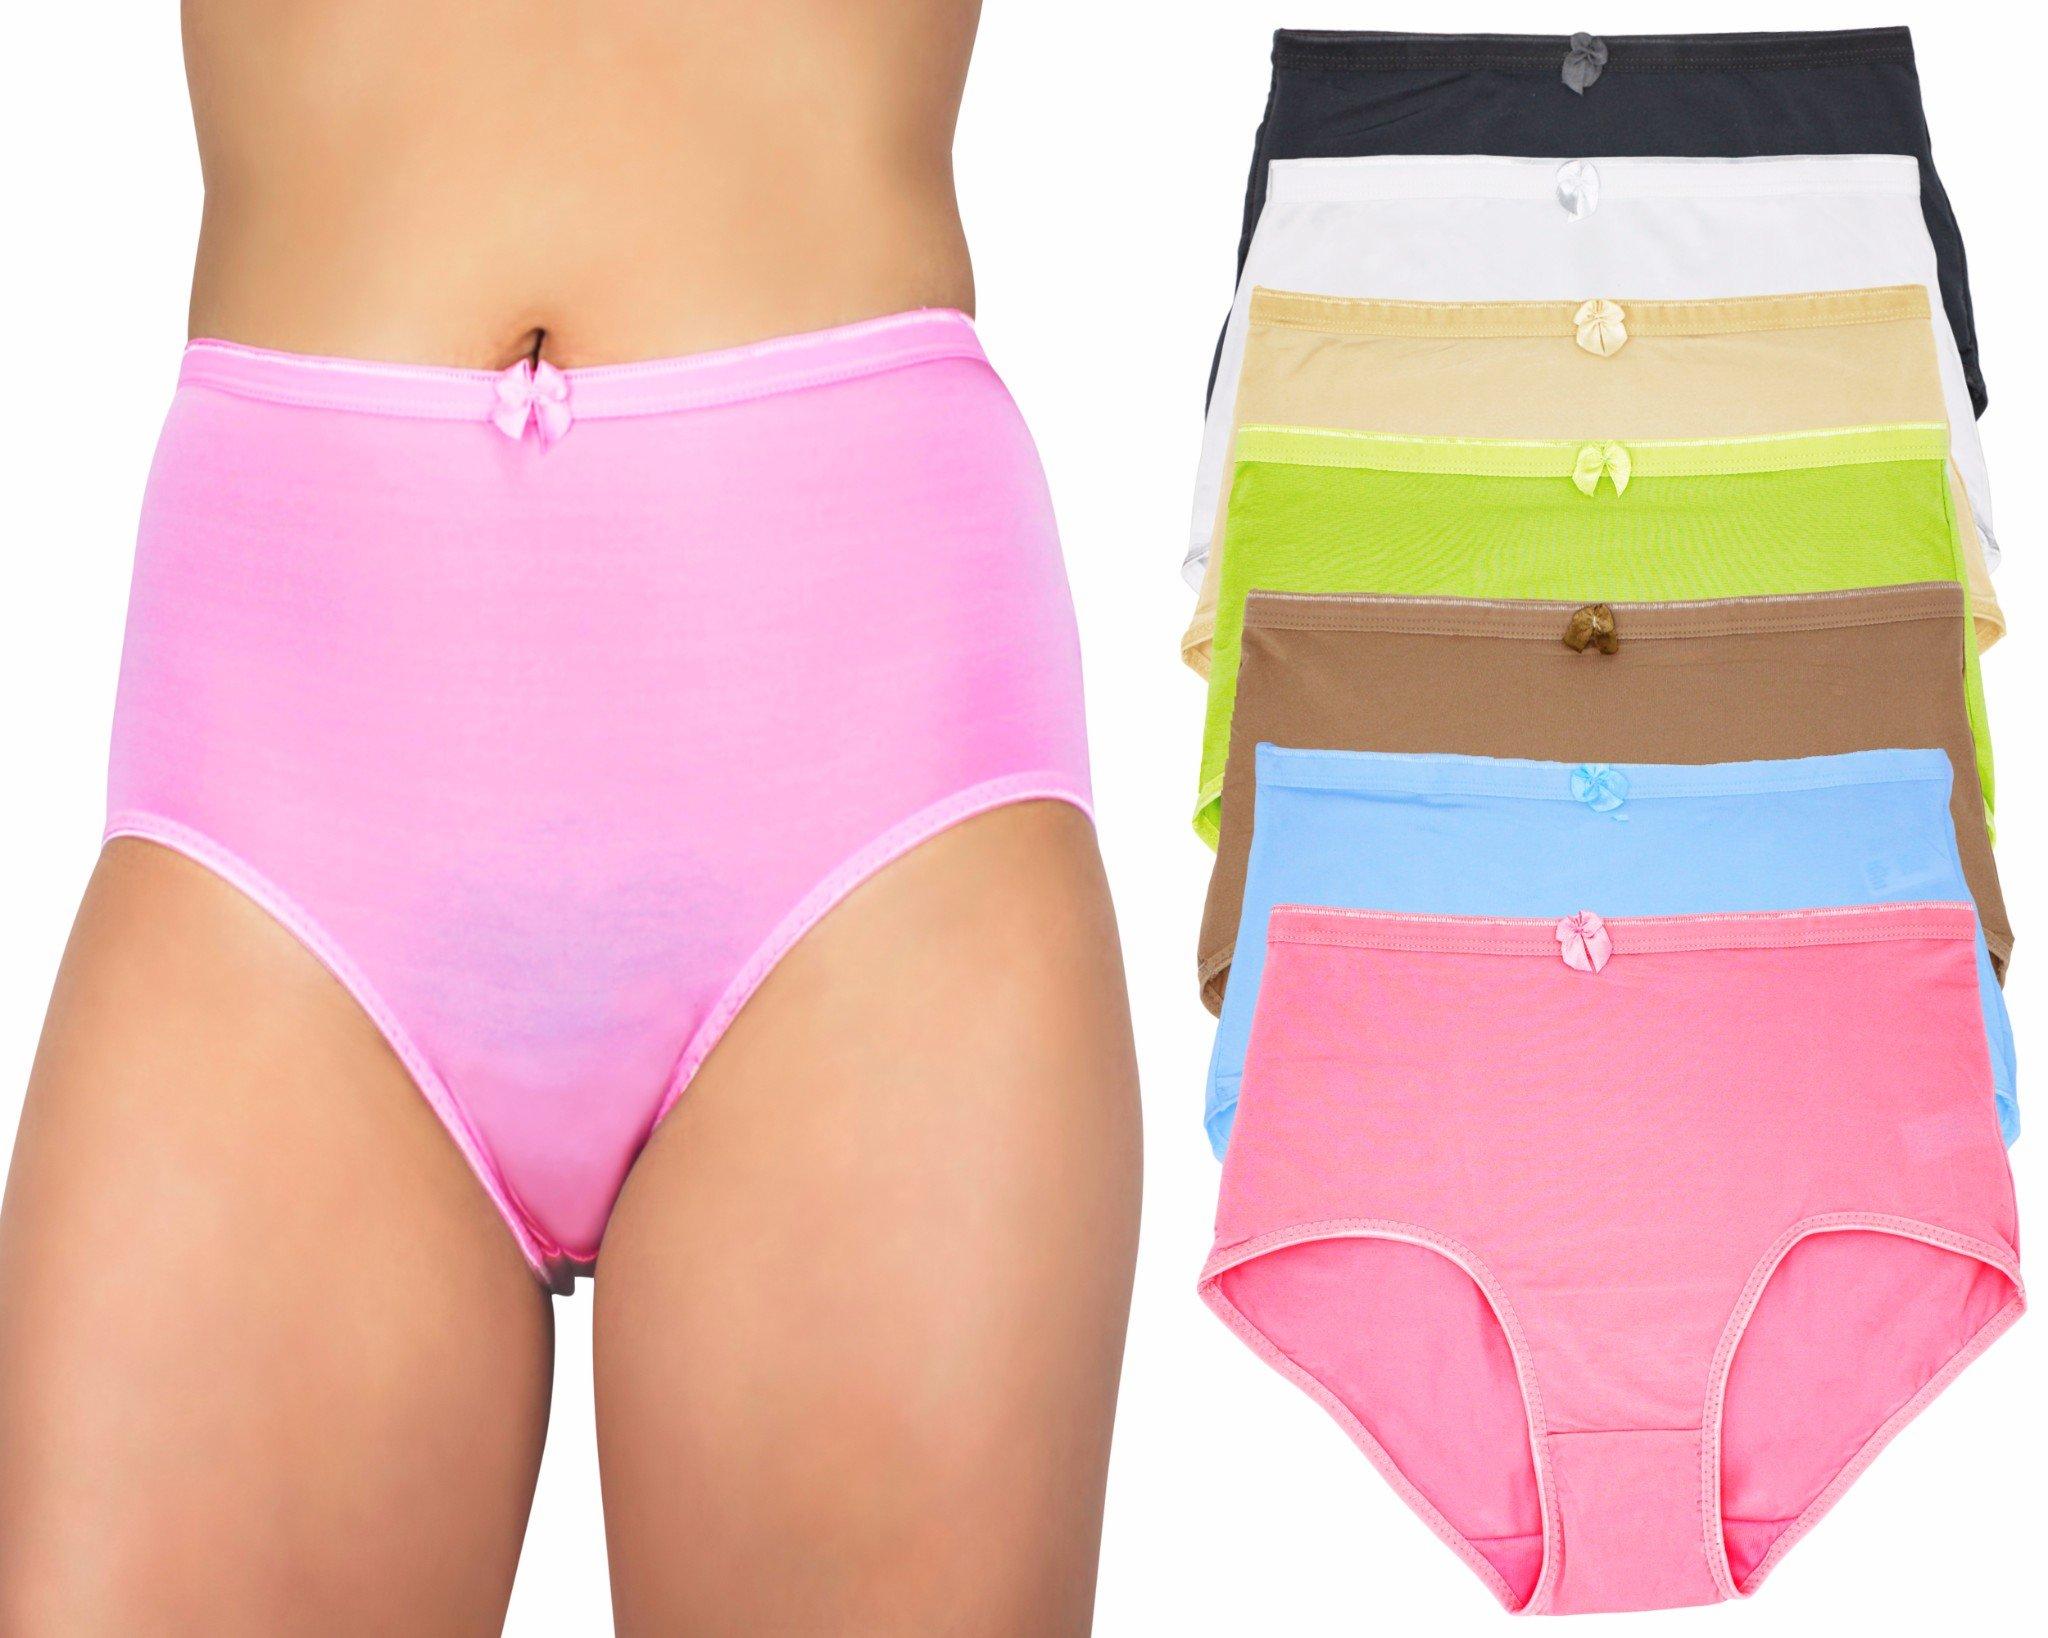 Capricia O'dare Women's High Waist Tummy Control Briefs Panties (6 Pack, Size: 2XL)